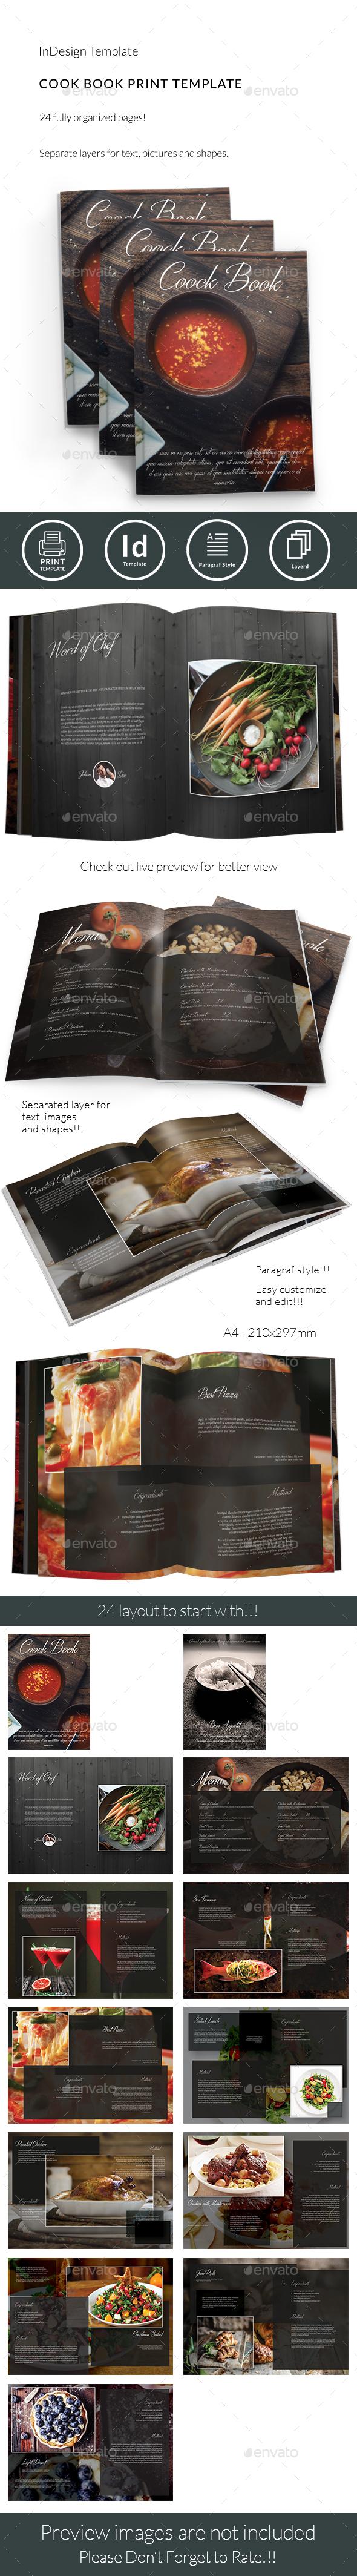 CookBook/Restaurant Menu Template